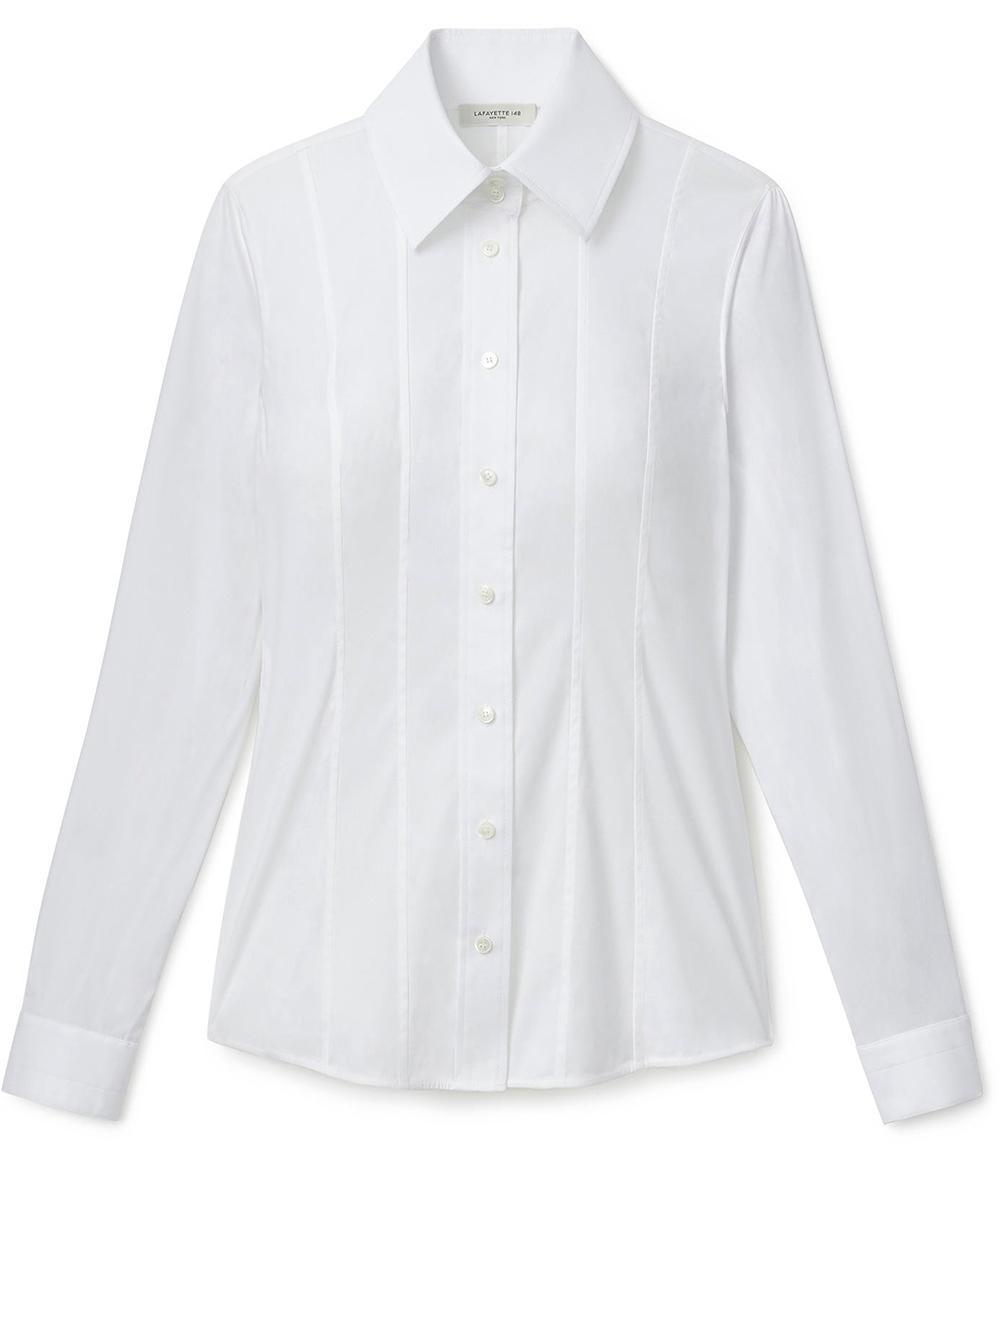 Abbott Shirt Item # MBCJ5R-0231